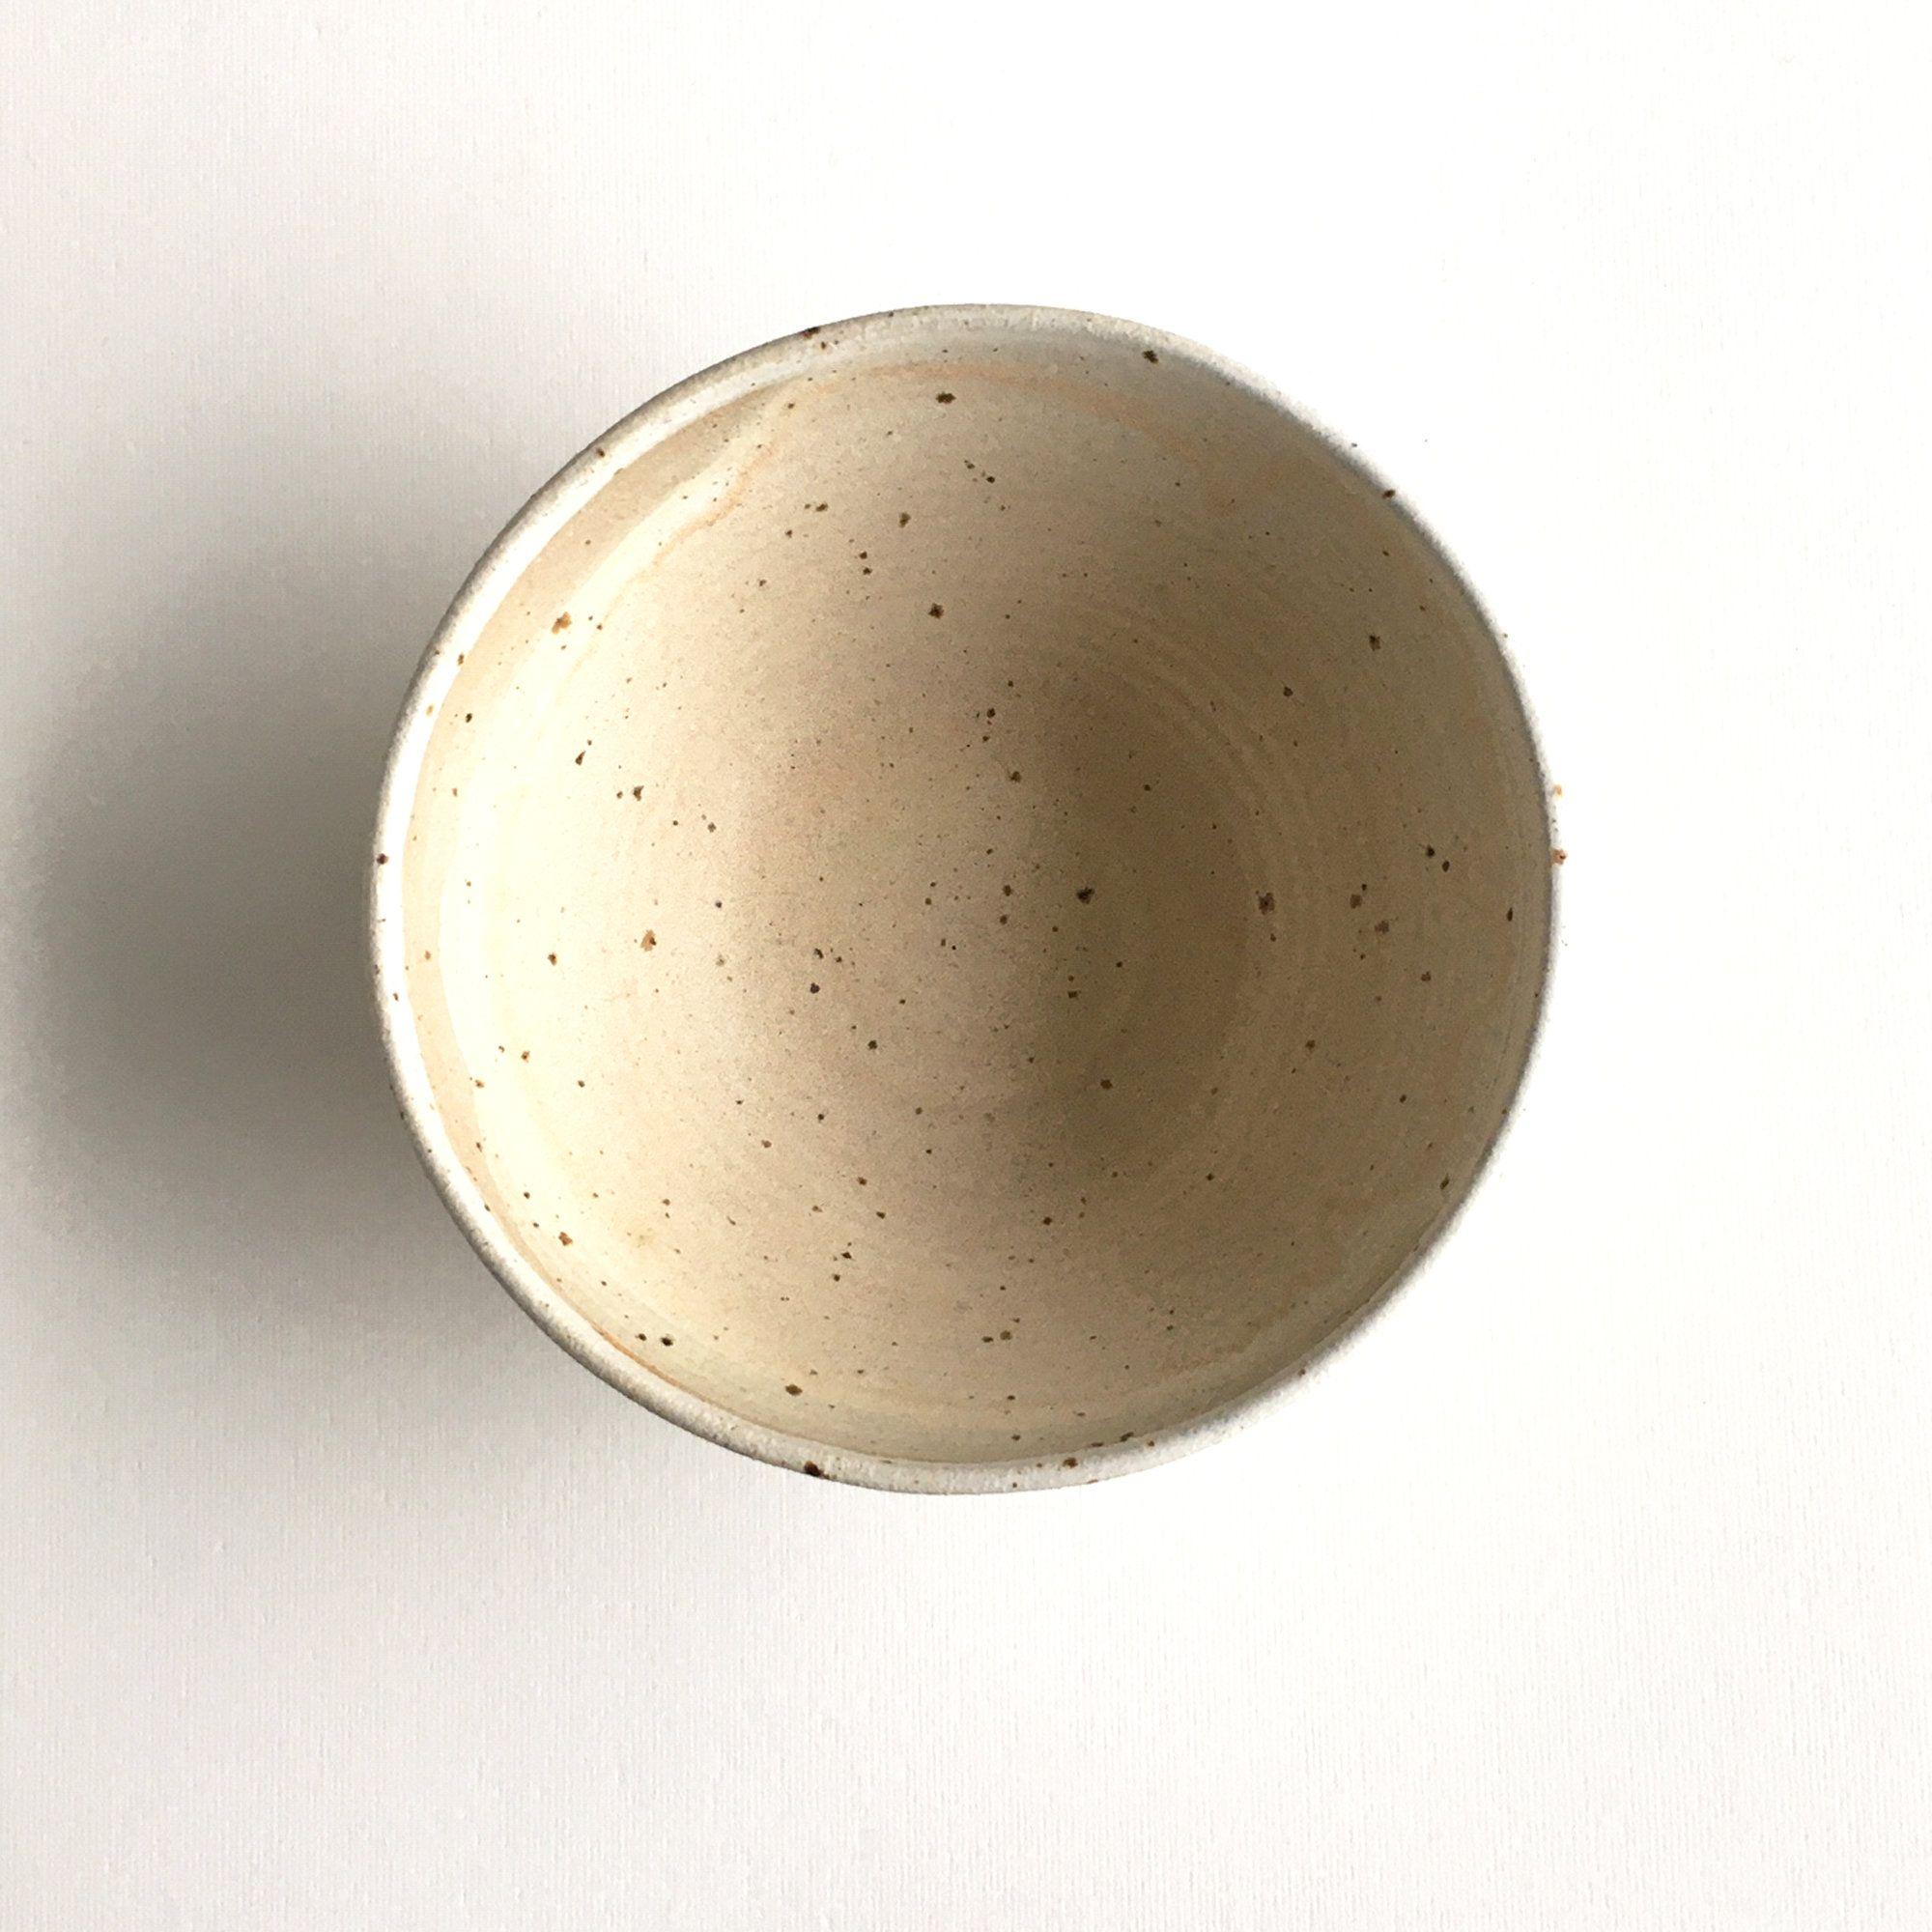 Farmhouse style bowl, Ivory Bowl nr. 2, Gift for her, Tapas Handmade pale blush nude ceramics, Breakfast bowl Hygge Polli Pots, Scandinavian